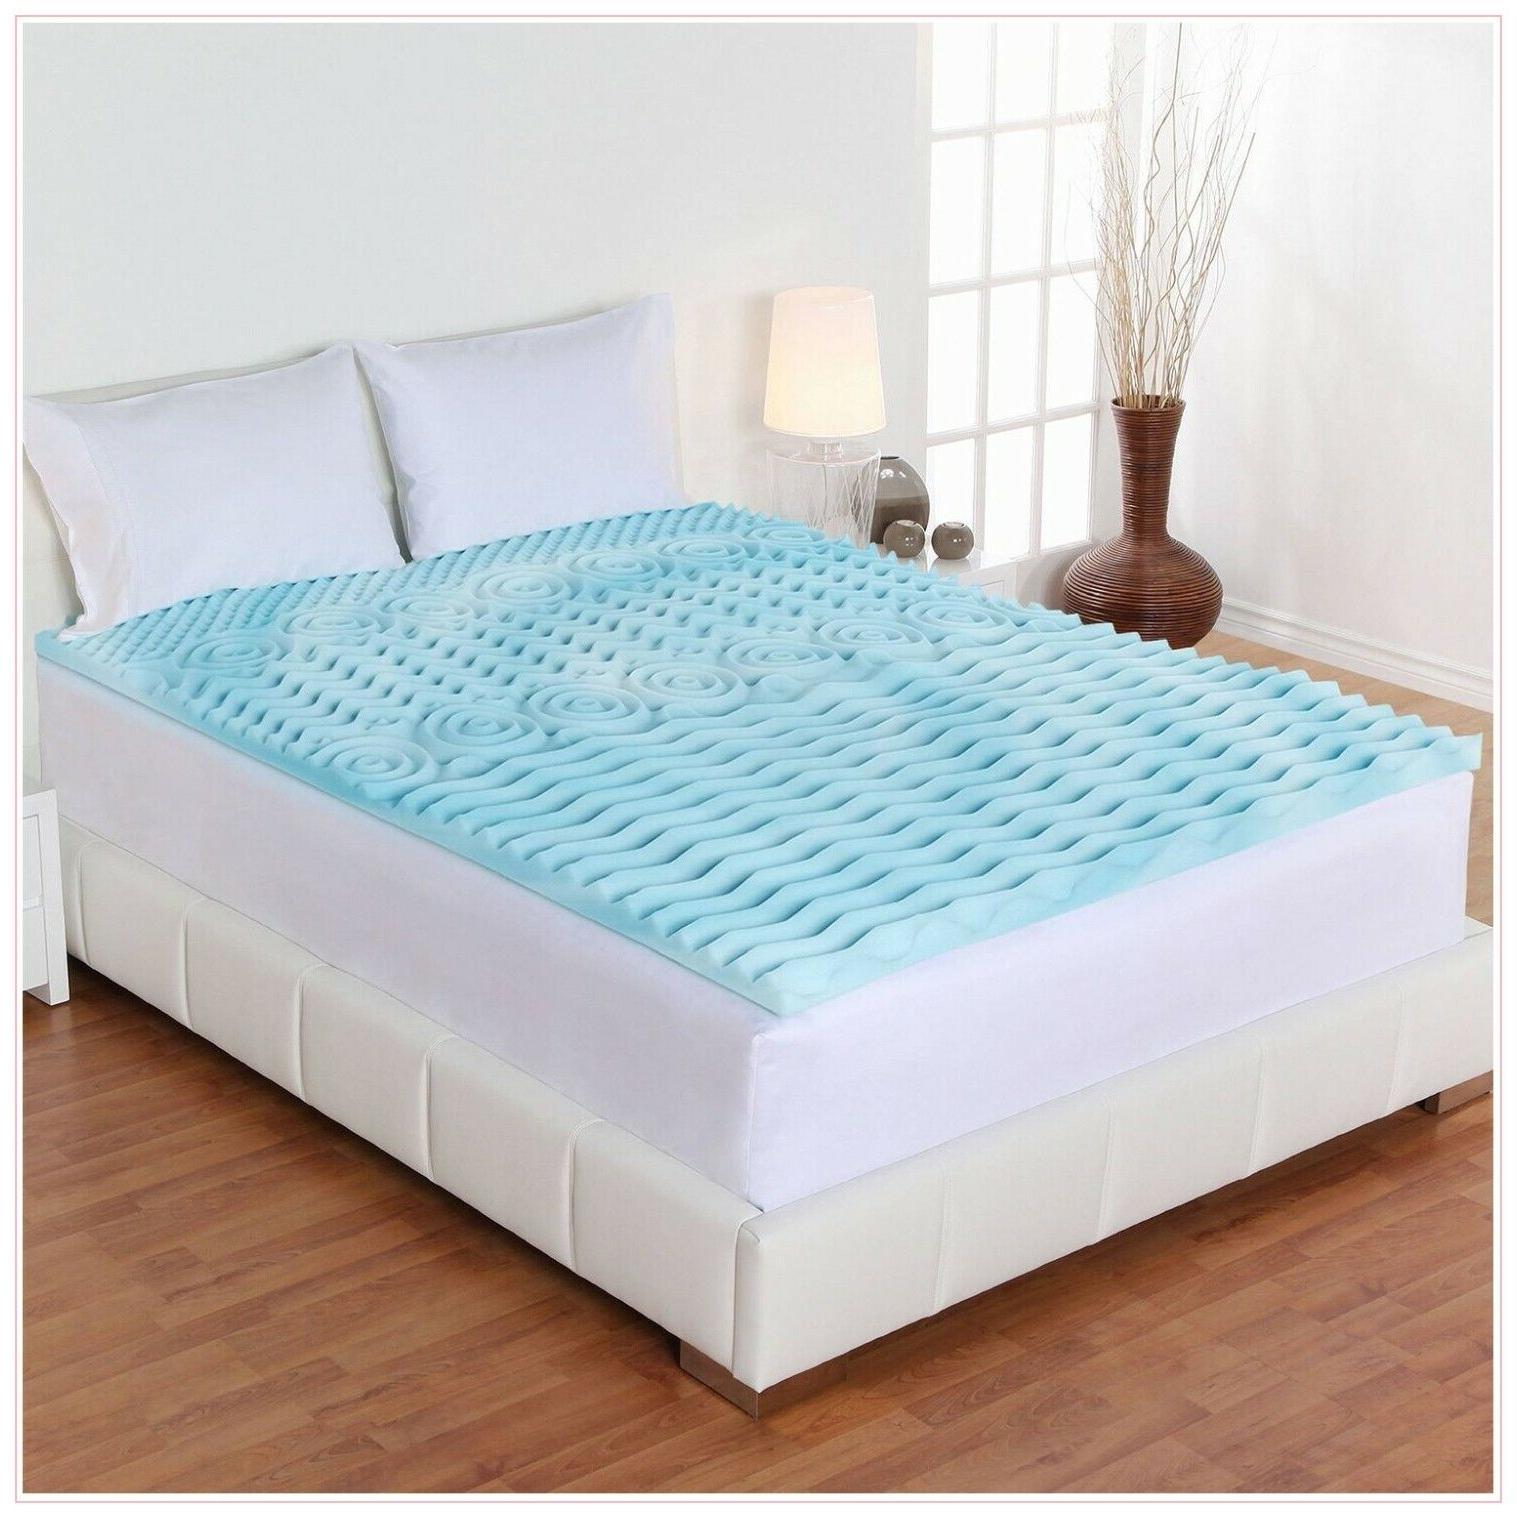 Orthopedic Bed Pad Zone Comfort Inch Foam Mattress Cover